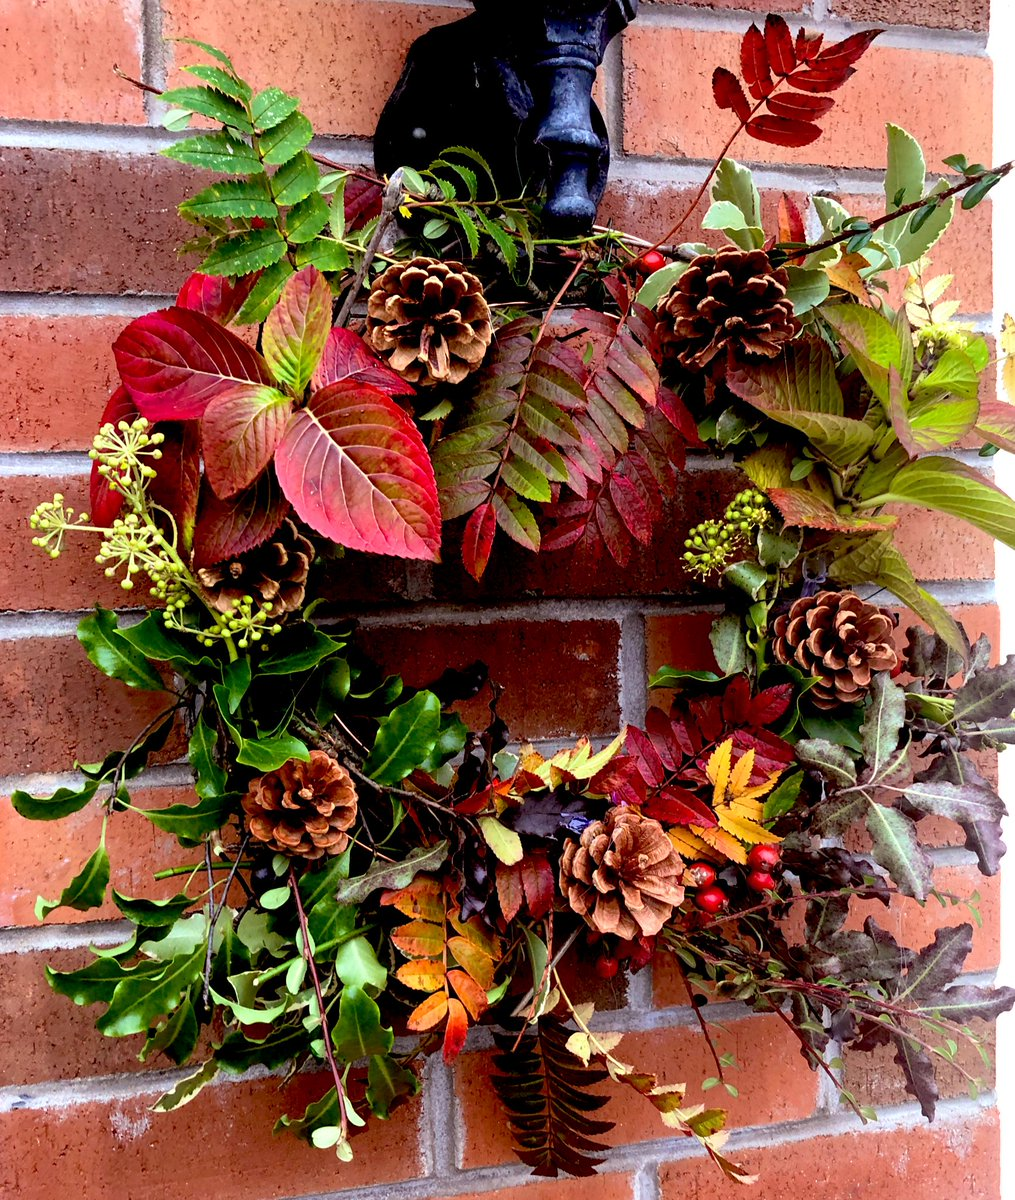 Autumn wreath complete #autumnvibes https://t.co/qp5B80WRaq